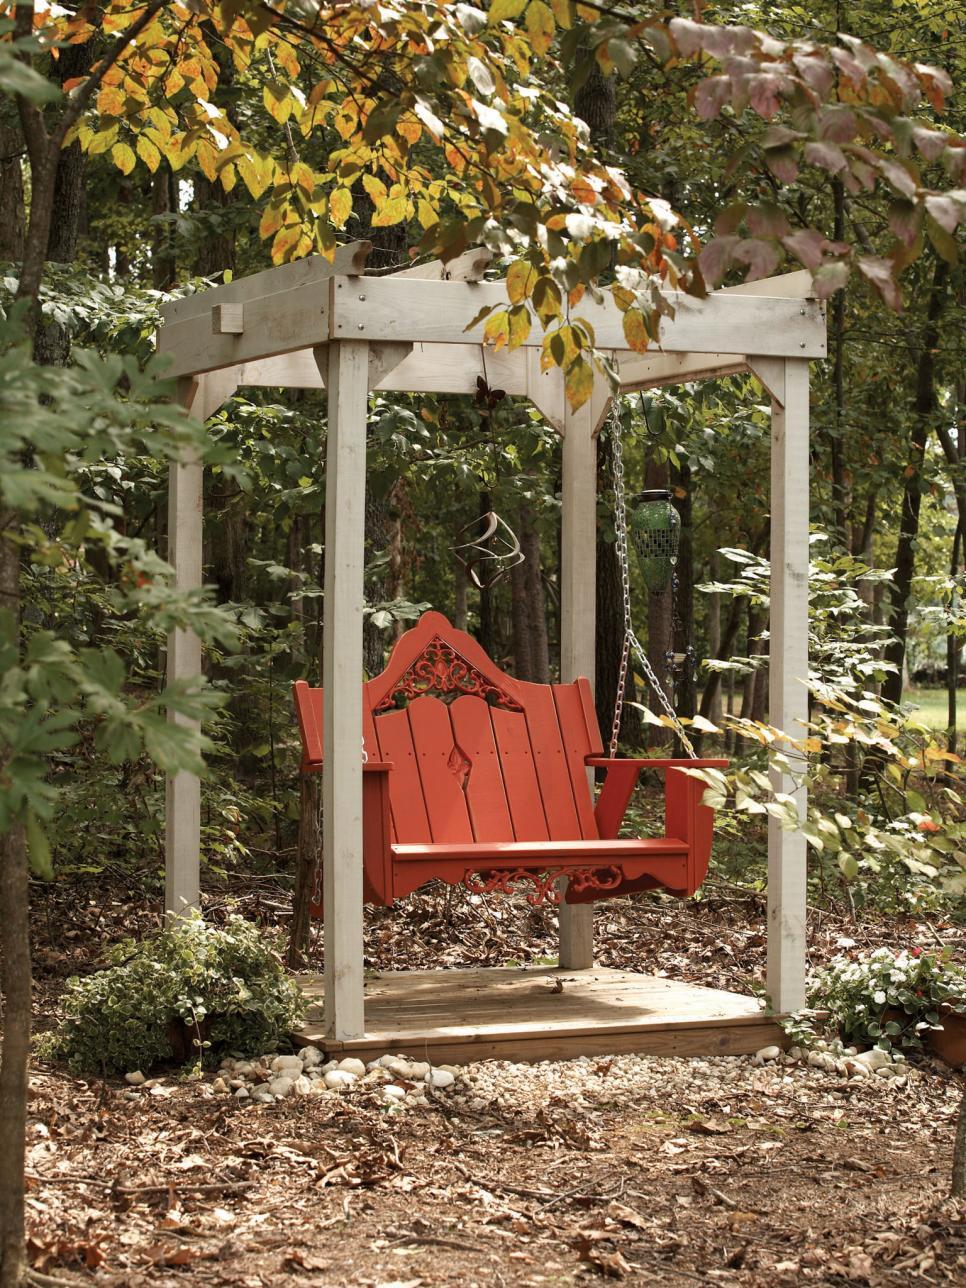 Garden Swings: The Enchanting Element in Your Backyard - Decorizer